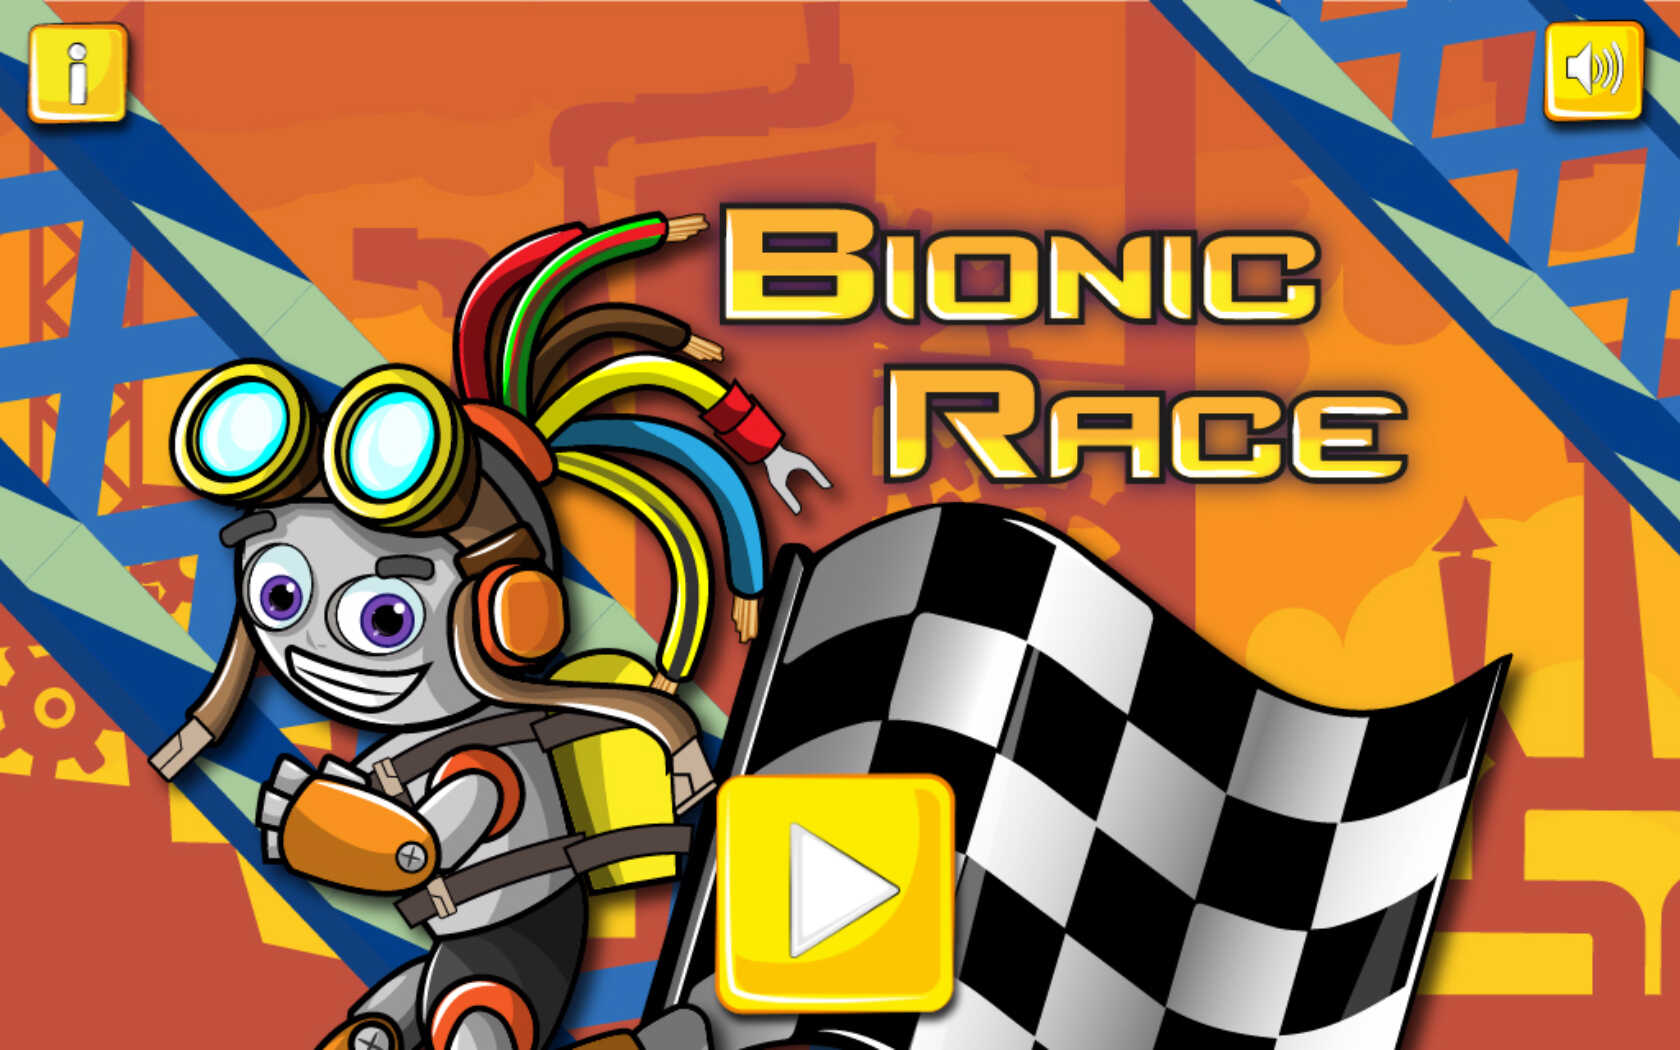 Image Bionic Race